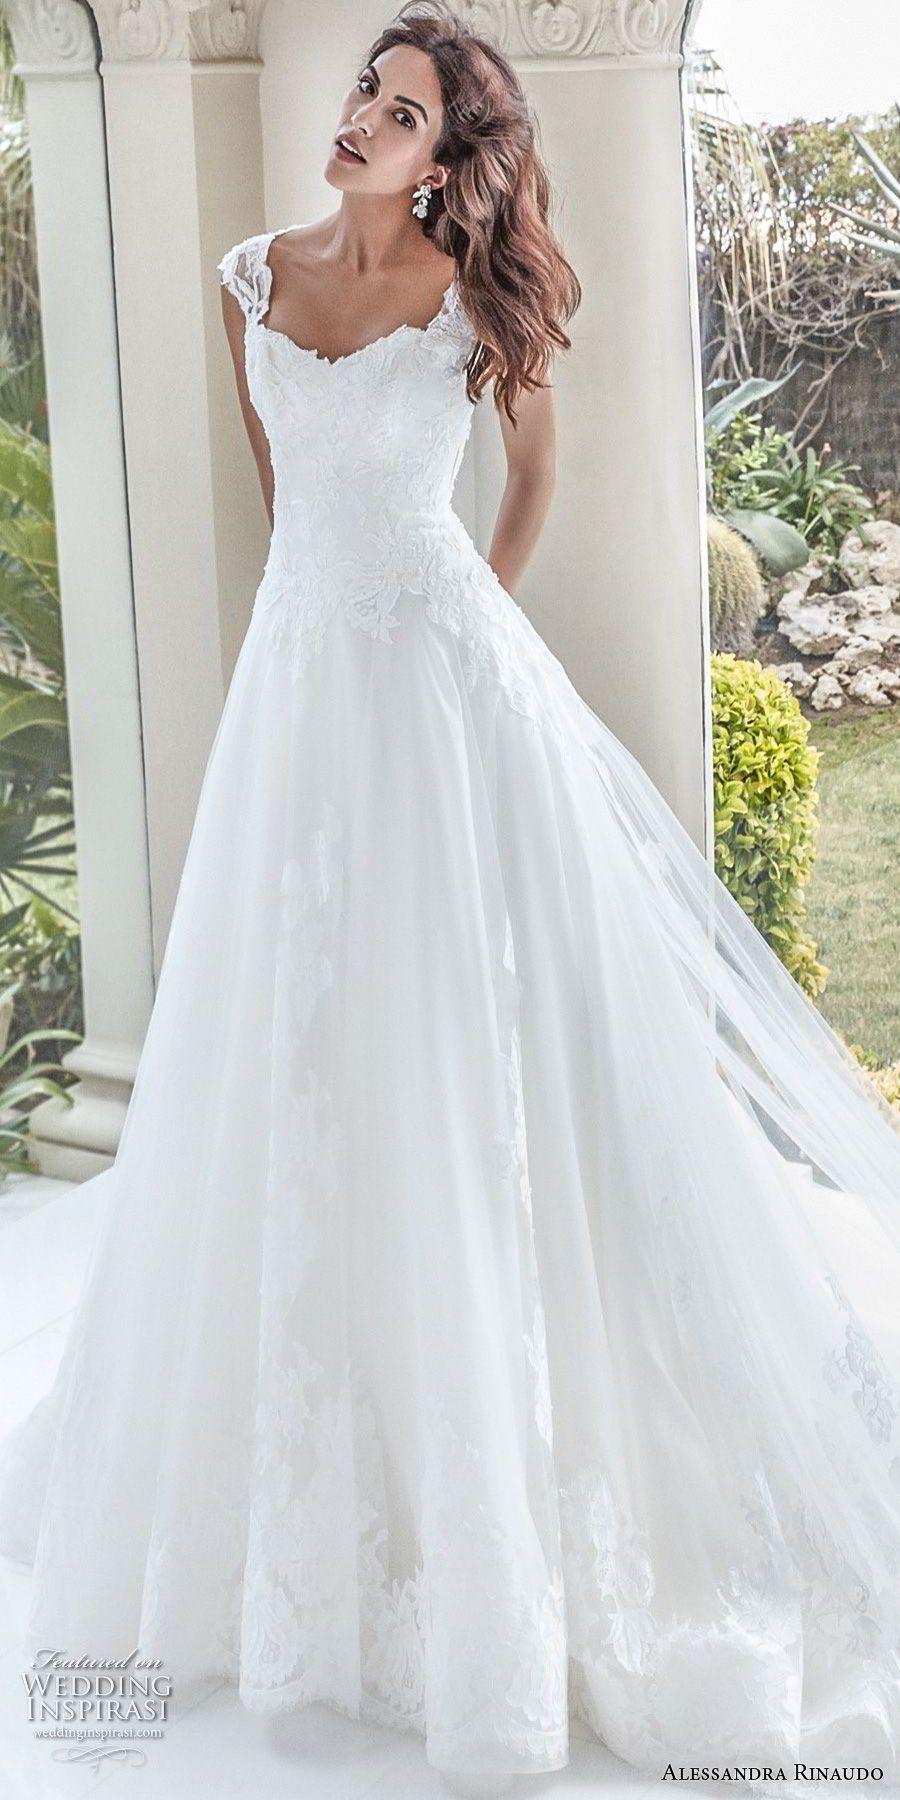 Lace wedding dress with cap sleeves sweetheart neckline  alessandra rinaudo  bridal cap sleeves sweetheart neckline